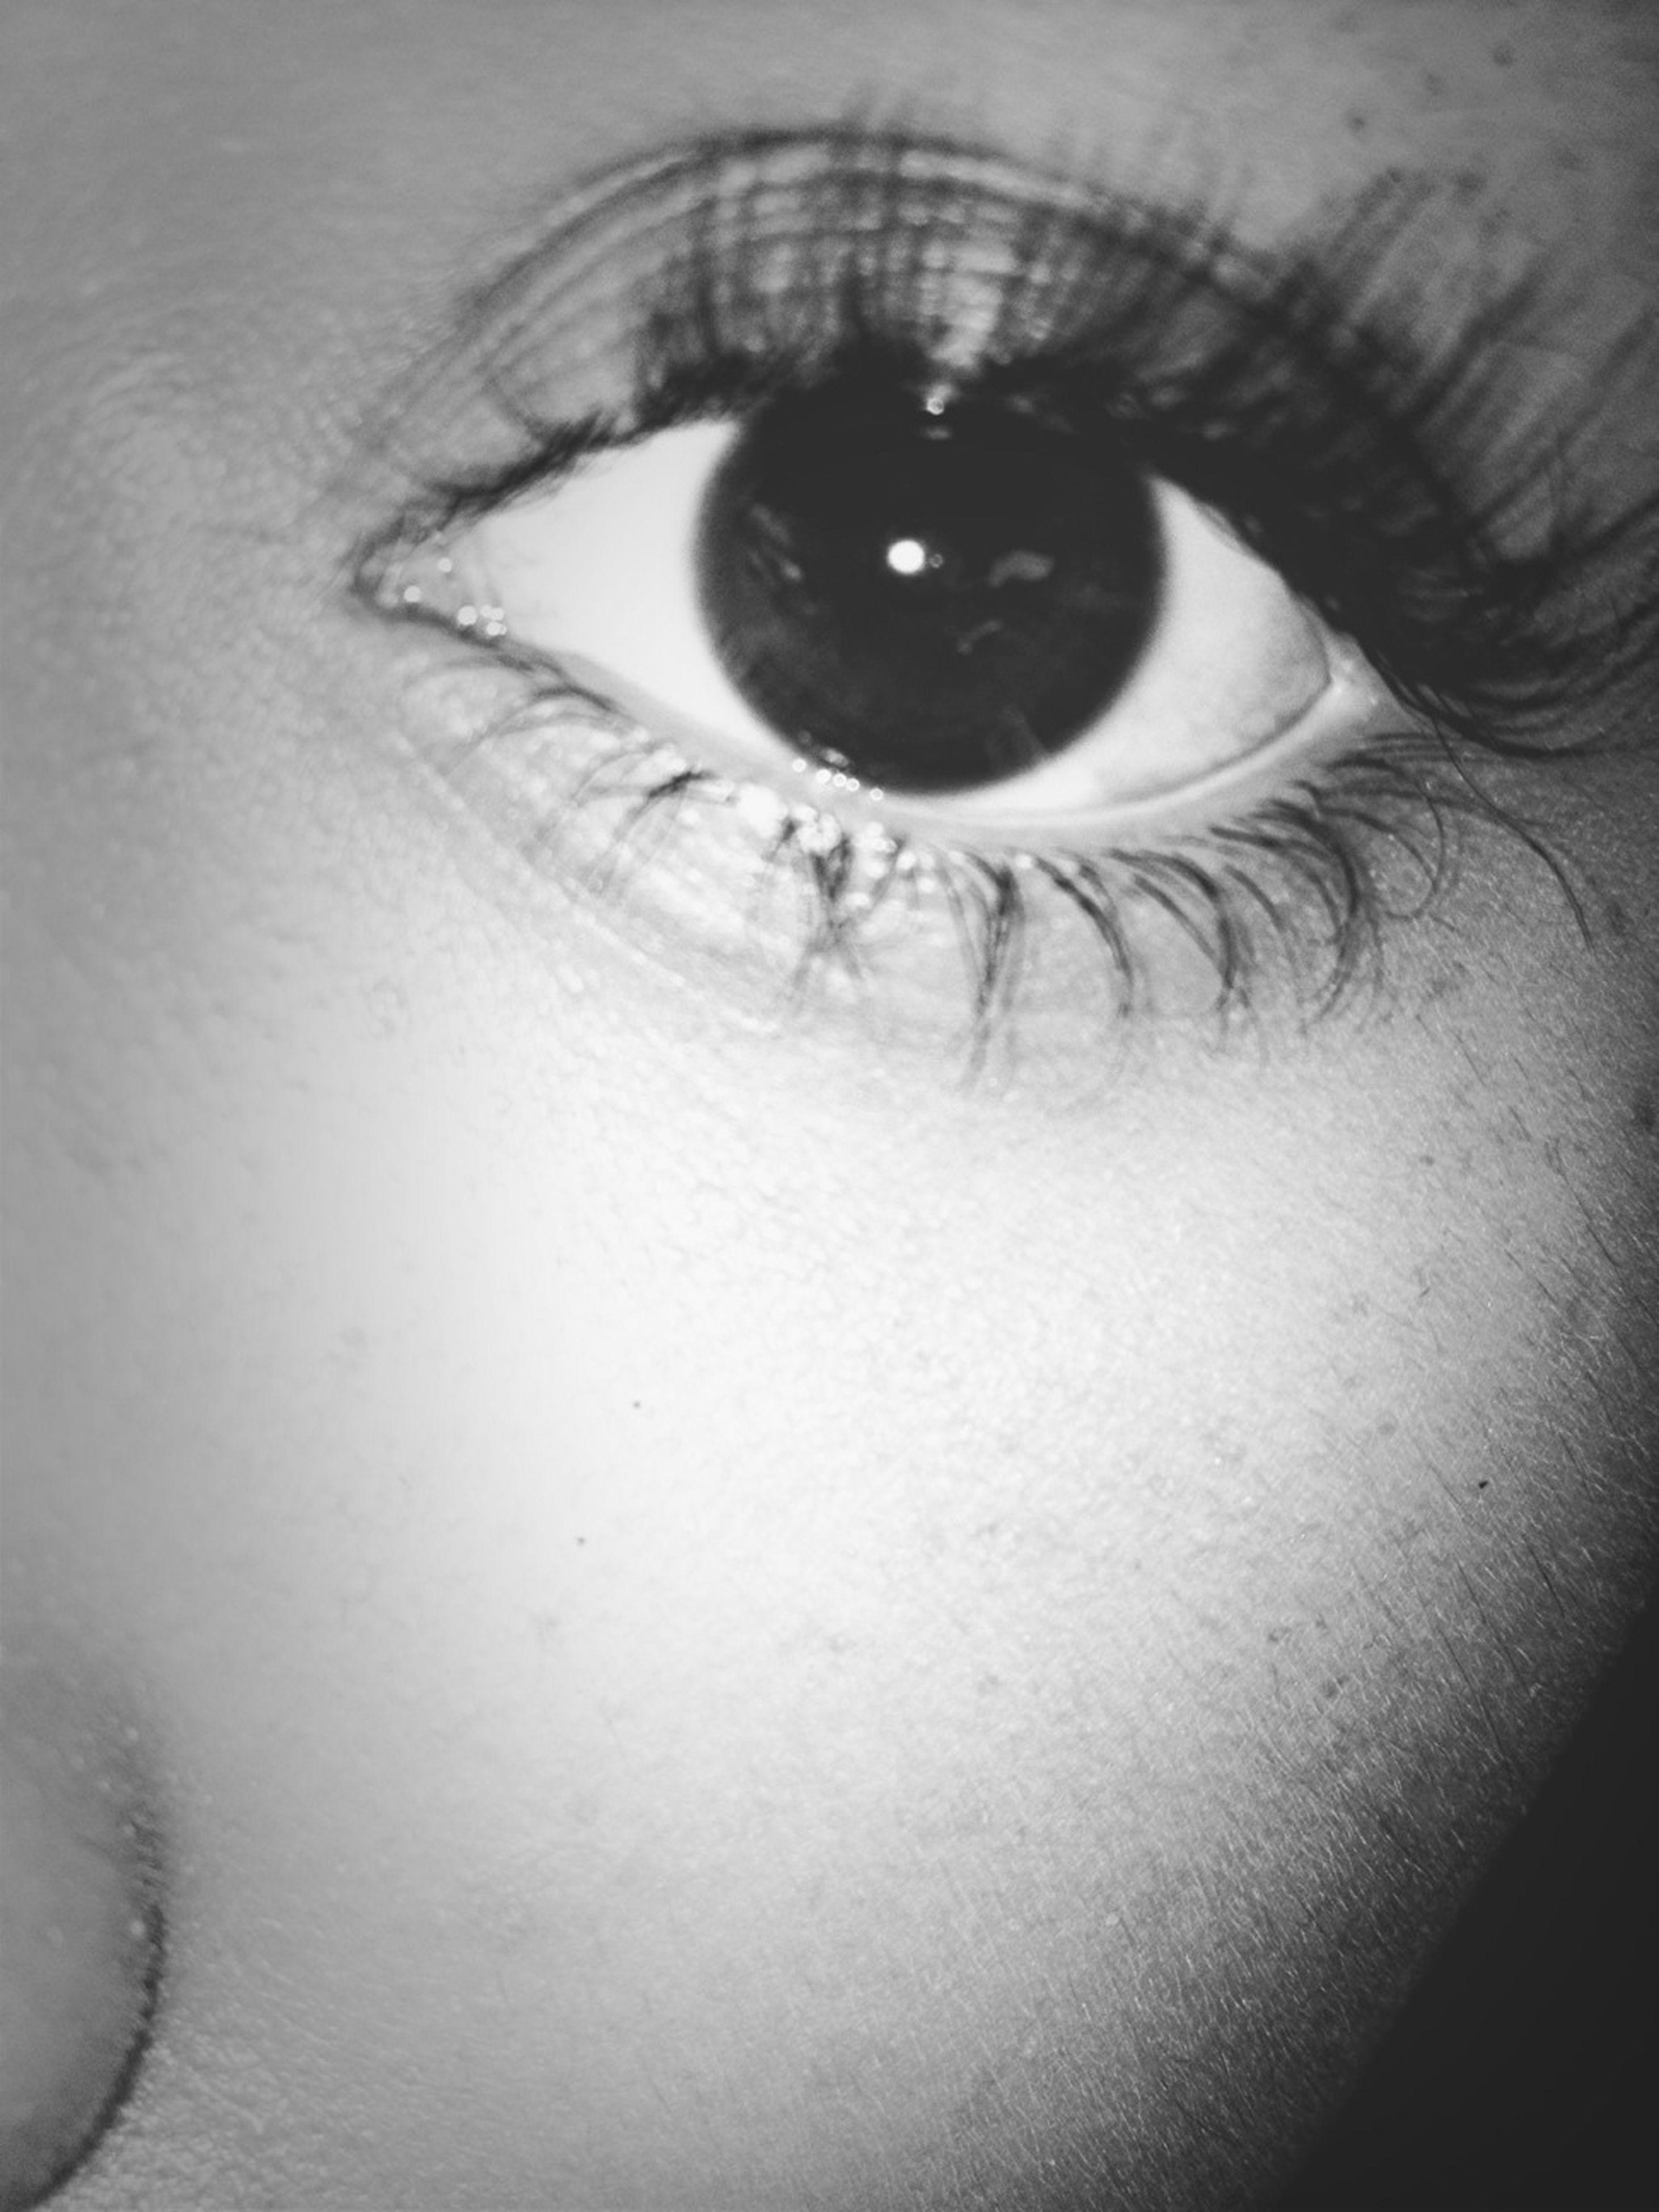 human eye, indoors, close-up, eyelash, looking at camera, portrait, eyesight, extreme close-up, sensory perception, full frame, part of, human face, backgrounds, human skin, iris - eye, lifestyles, front view